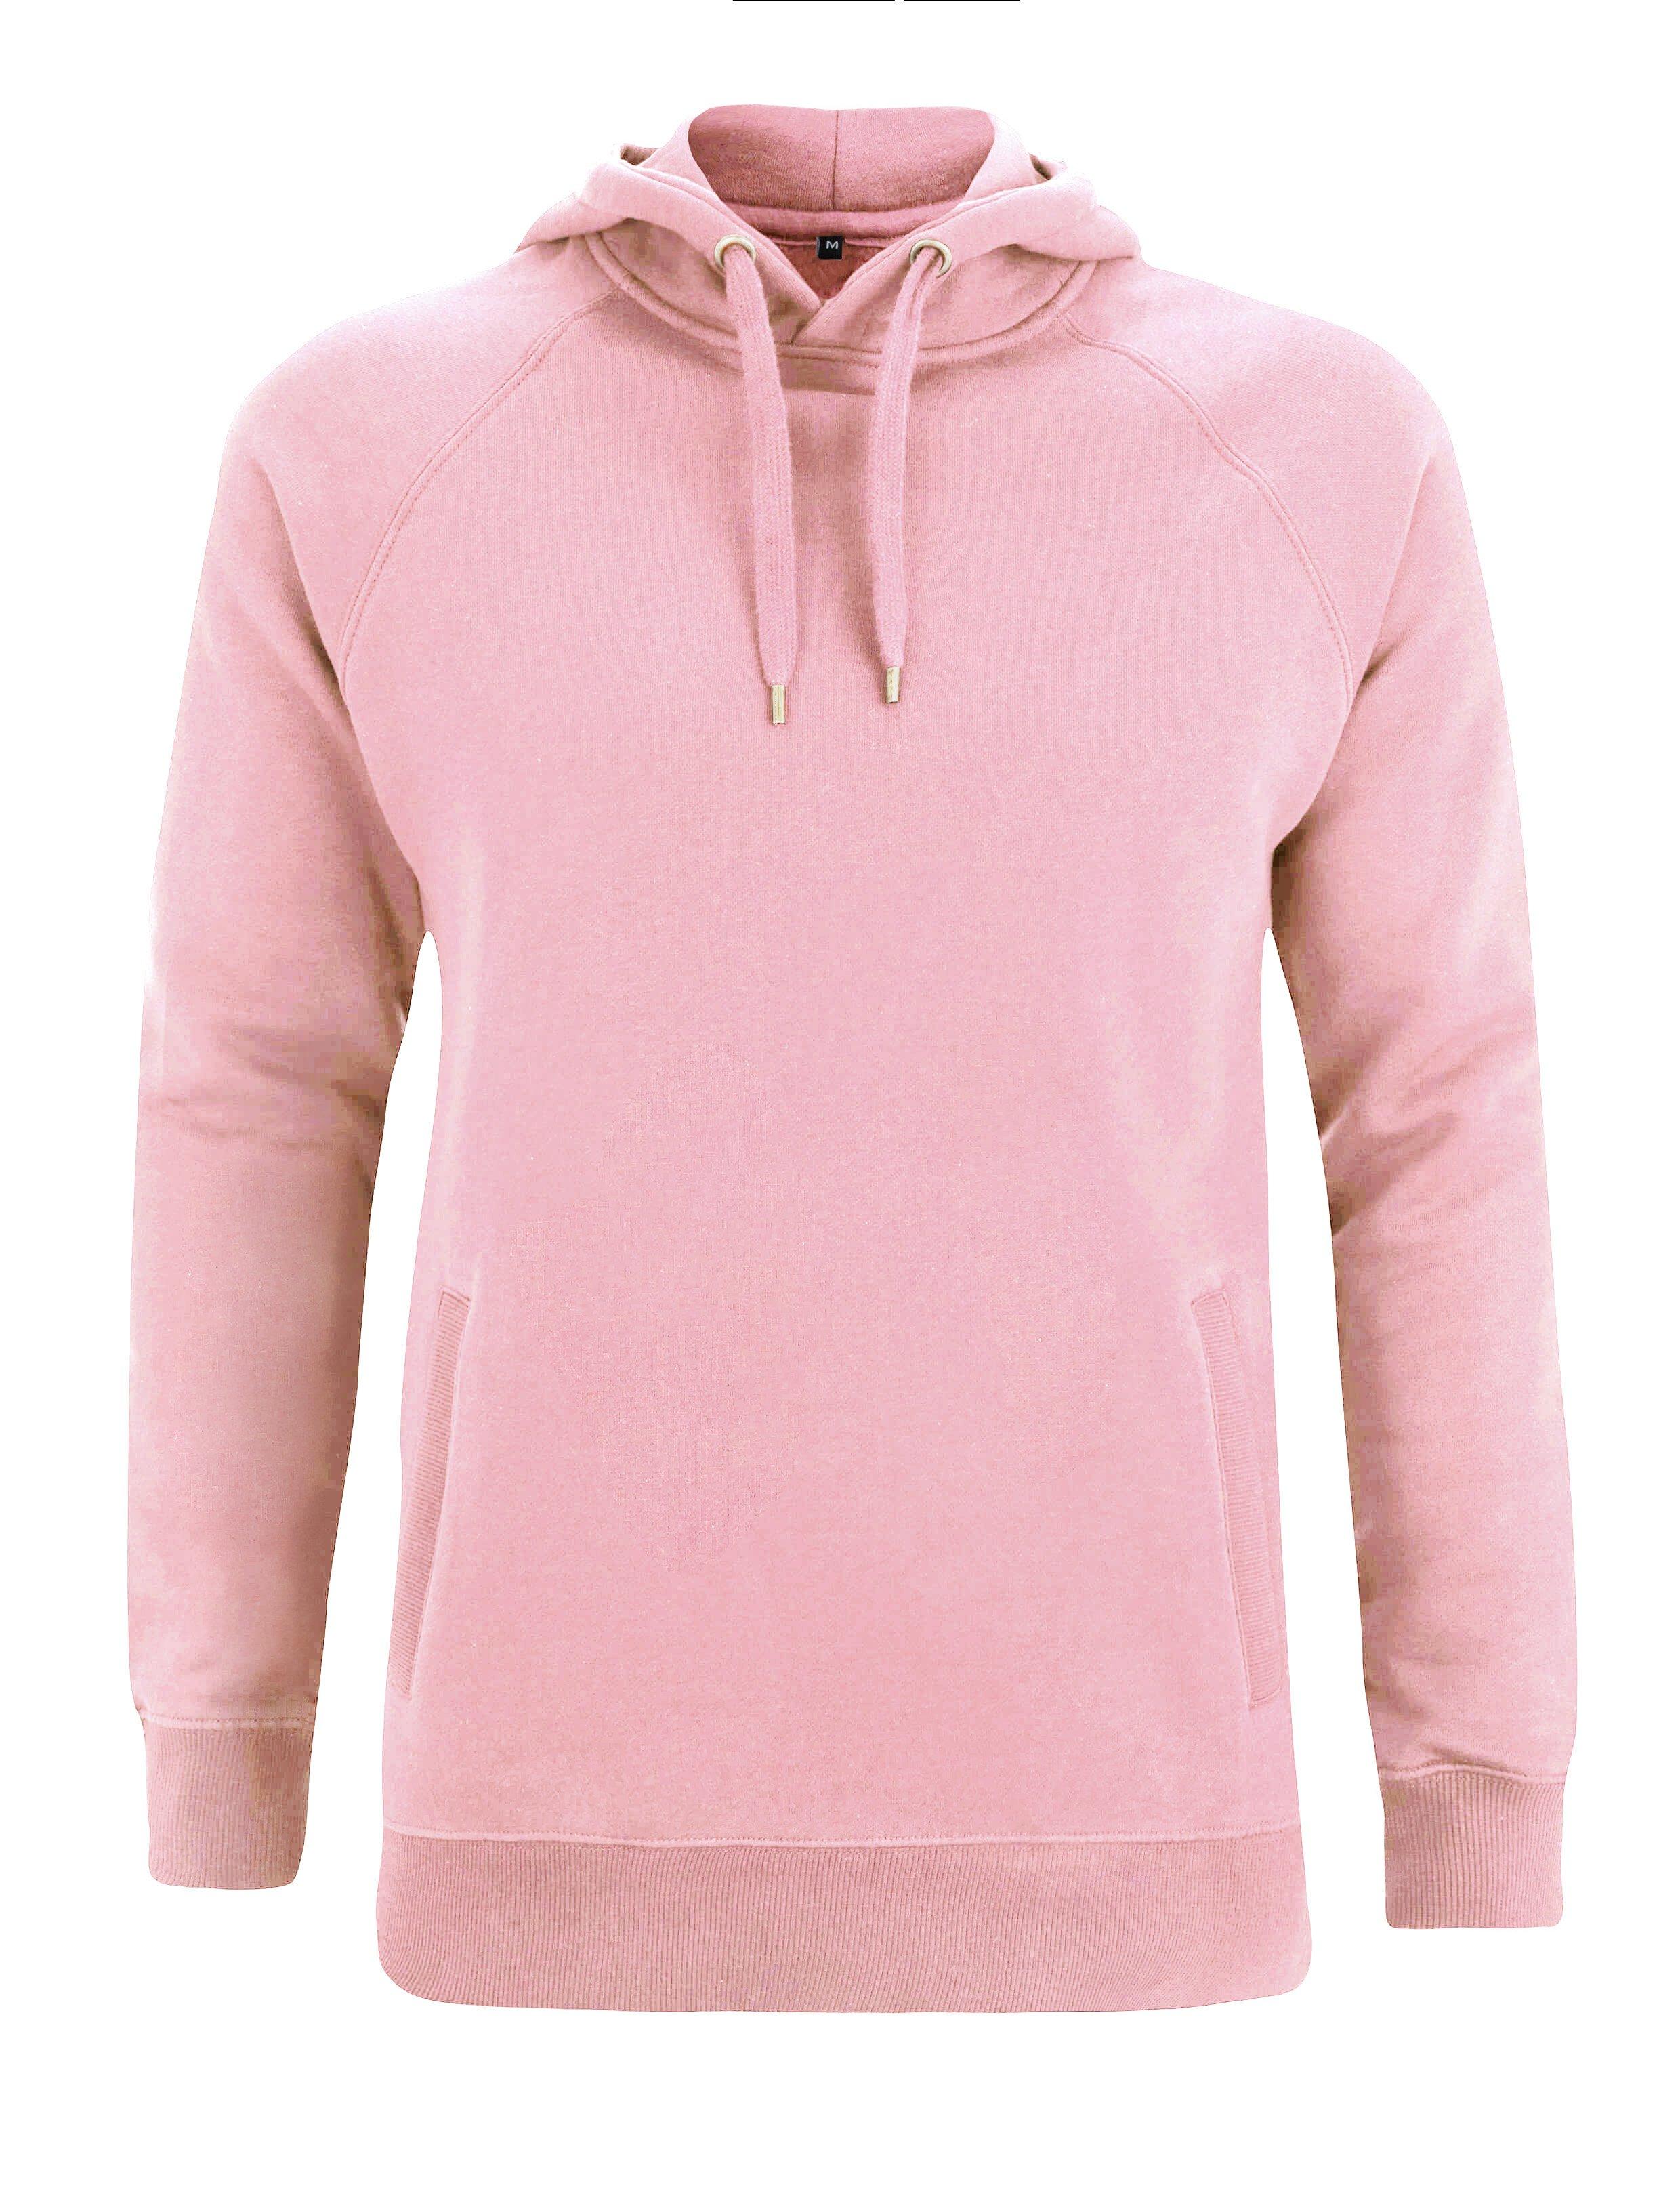 N50P-Candy-Pink.jpg